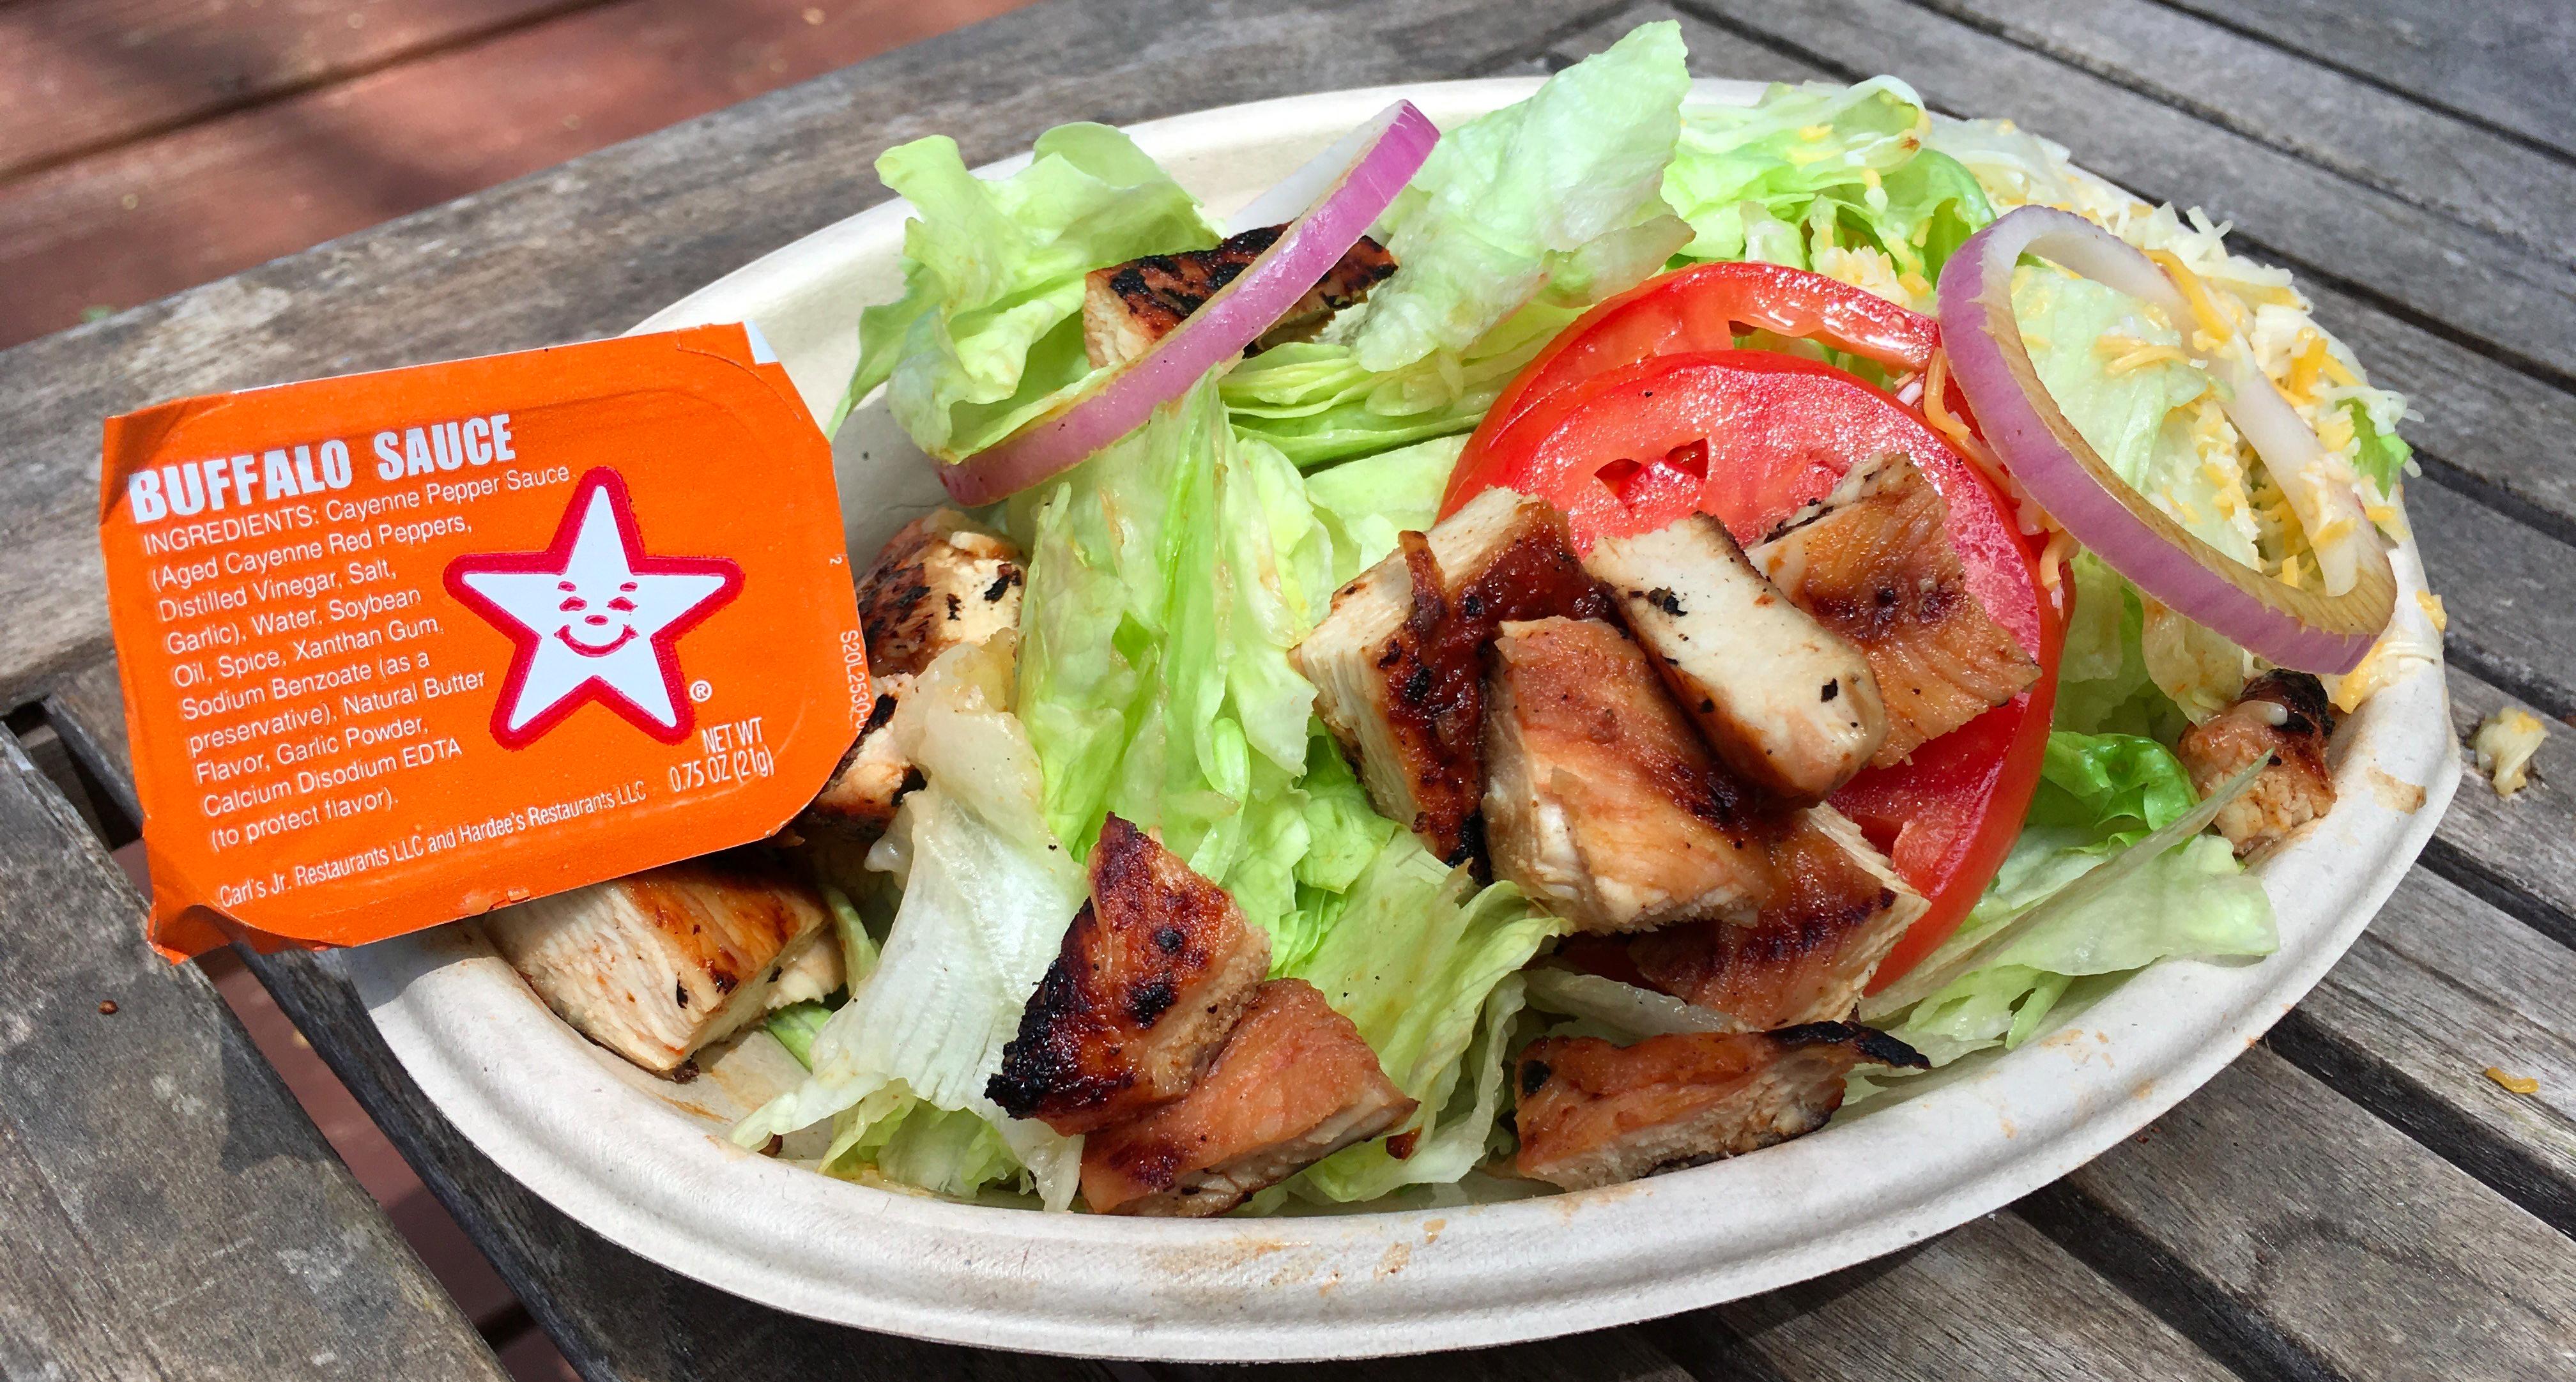 Carl's Jr. Low Carb Chicken Salad.